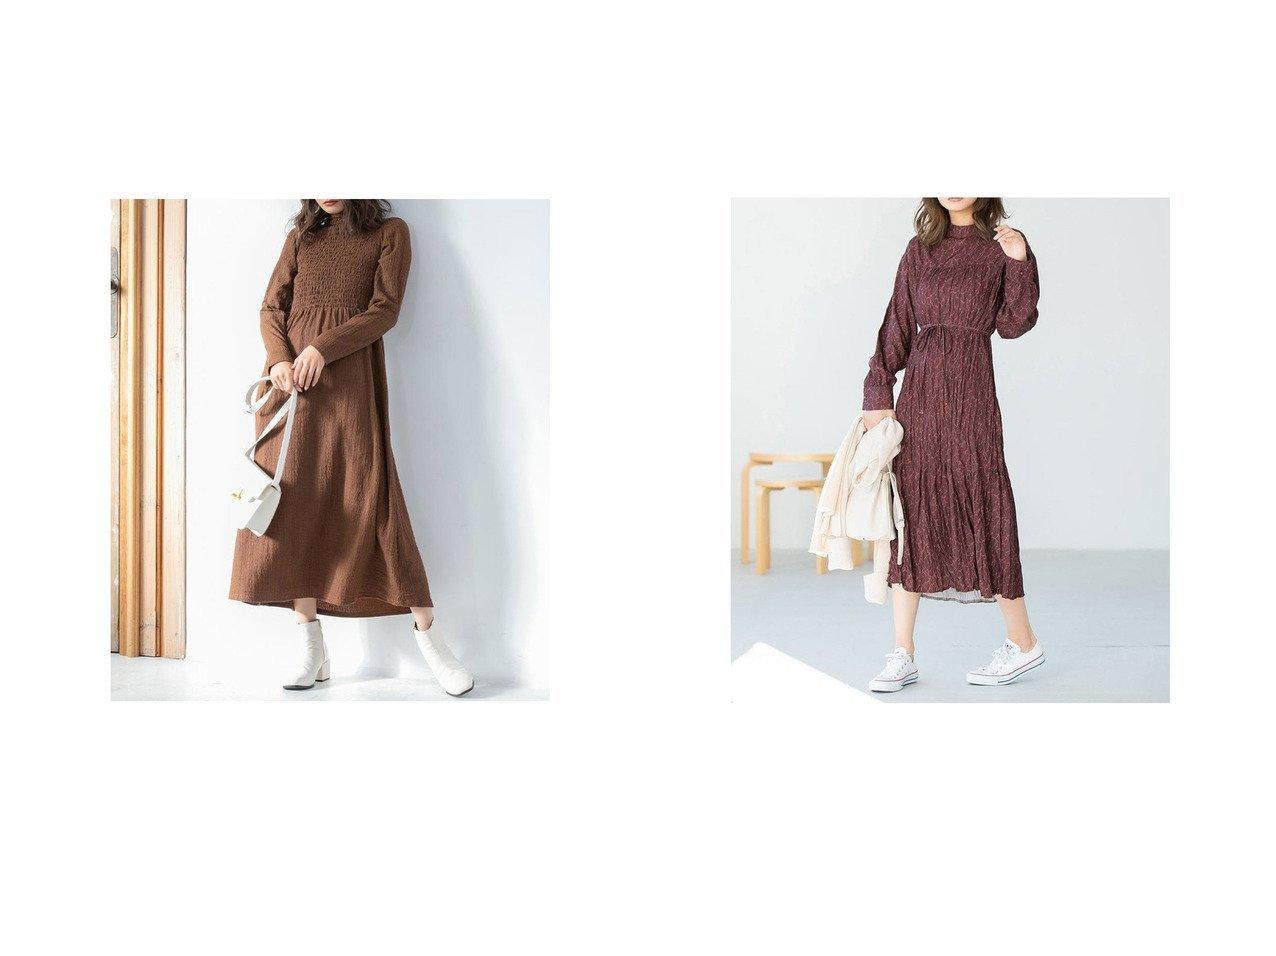 【fifth/フィフス】のフロントシャーリング切り替えワンピース&スタンドカラーワッシャープリーツワンピース fifthのおすすめ!人気、トレンド・レディースファッションの通販  おすすめで人気の流行・トレンド、ファッションの通販商品 メンズファッション・キッズファッション・インテリア・家具・レディースファッション・服の通販 founy(ファニー) https://founy.com/ ファッション Fashion レディースファッション WOMEN ワンピース Dress 2021年 2021 2021 春夏 S/S SS Spring/Summer 2021 S/S 春夏 SS Spring/Summer シャーリング スマート フェミニン フレア フロント 春 Spring |ID:crp329100000017635